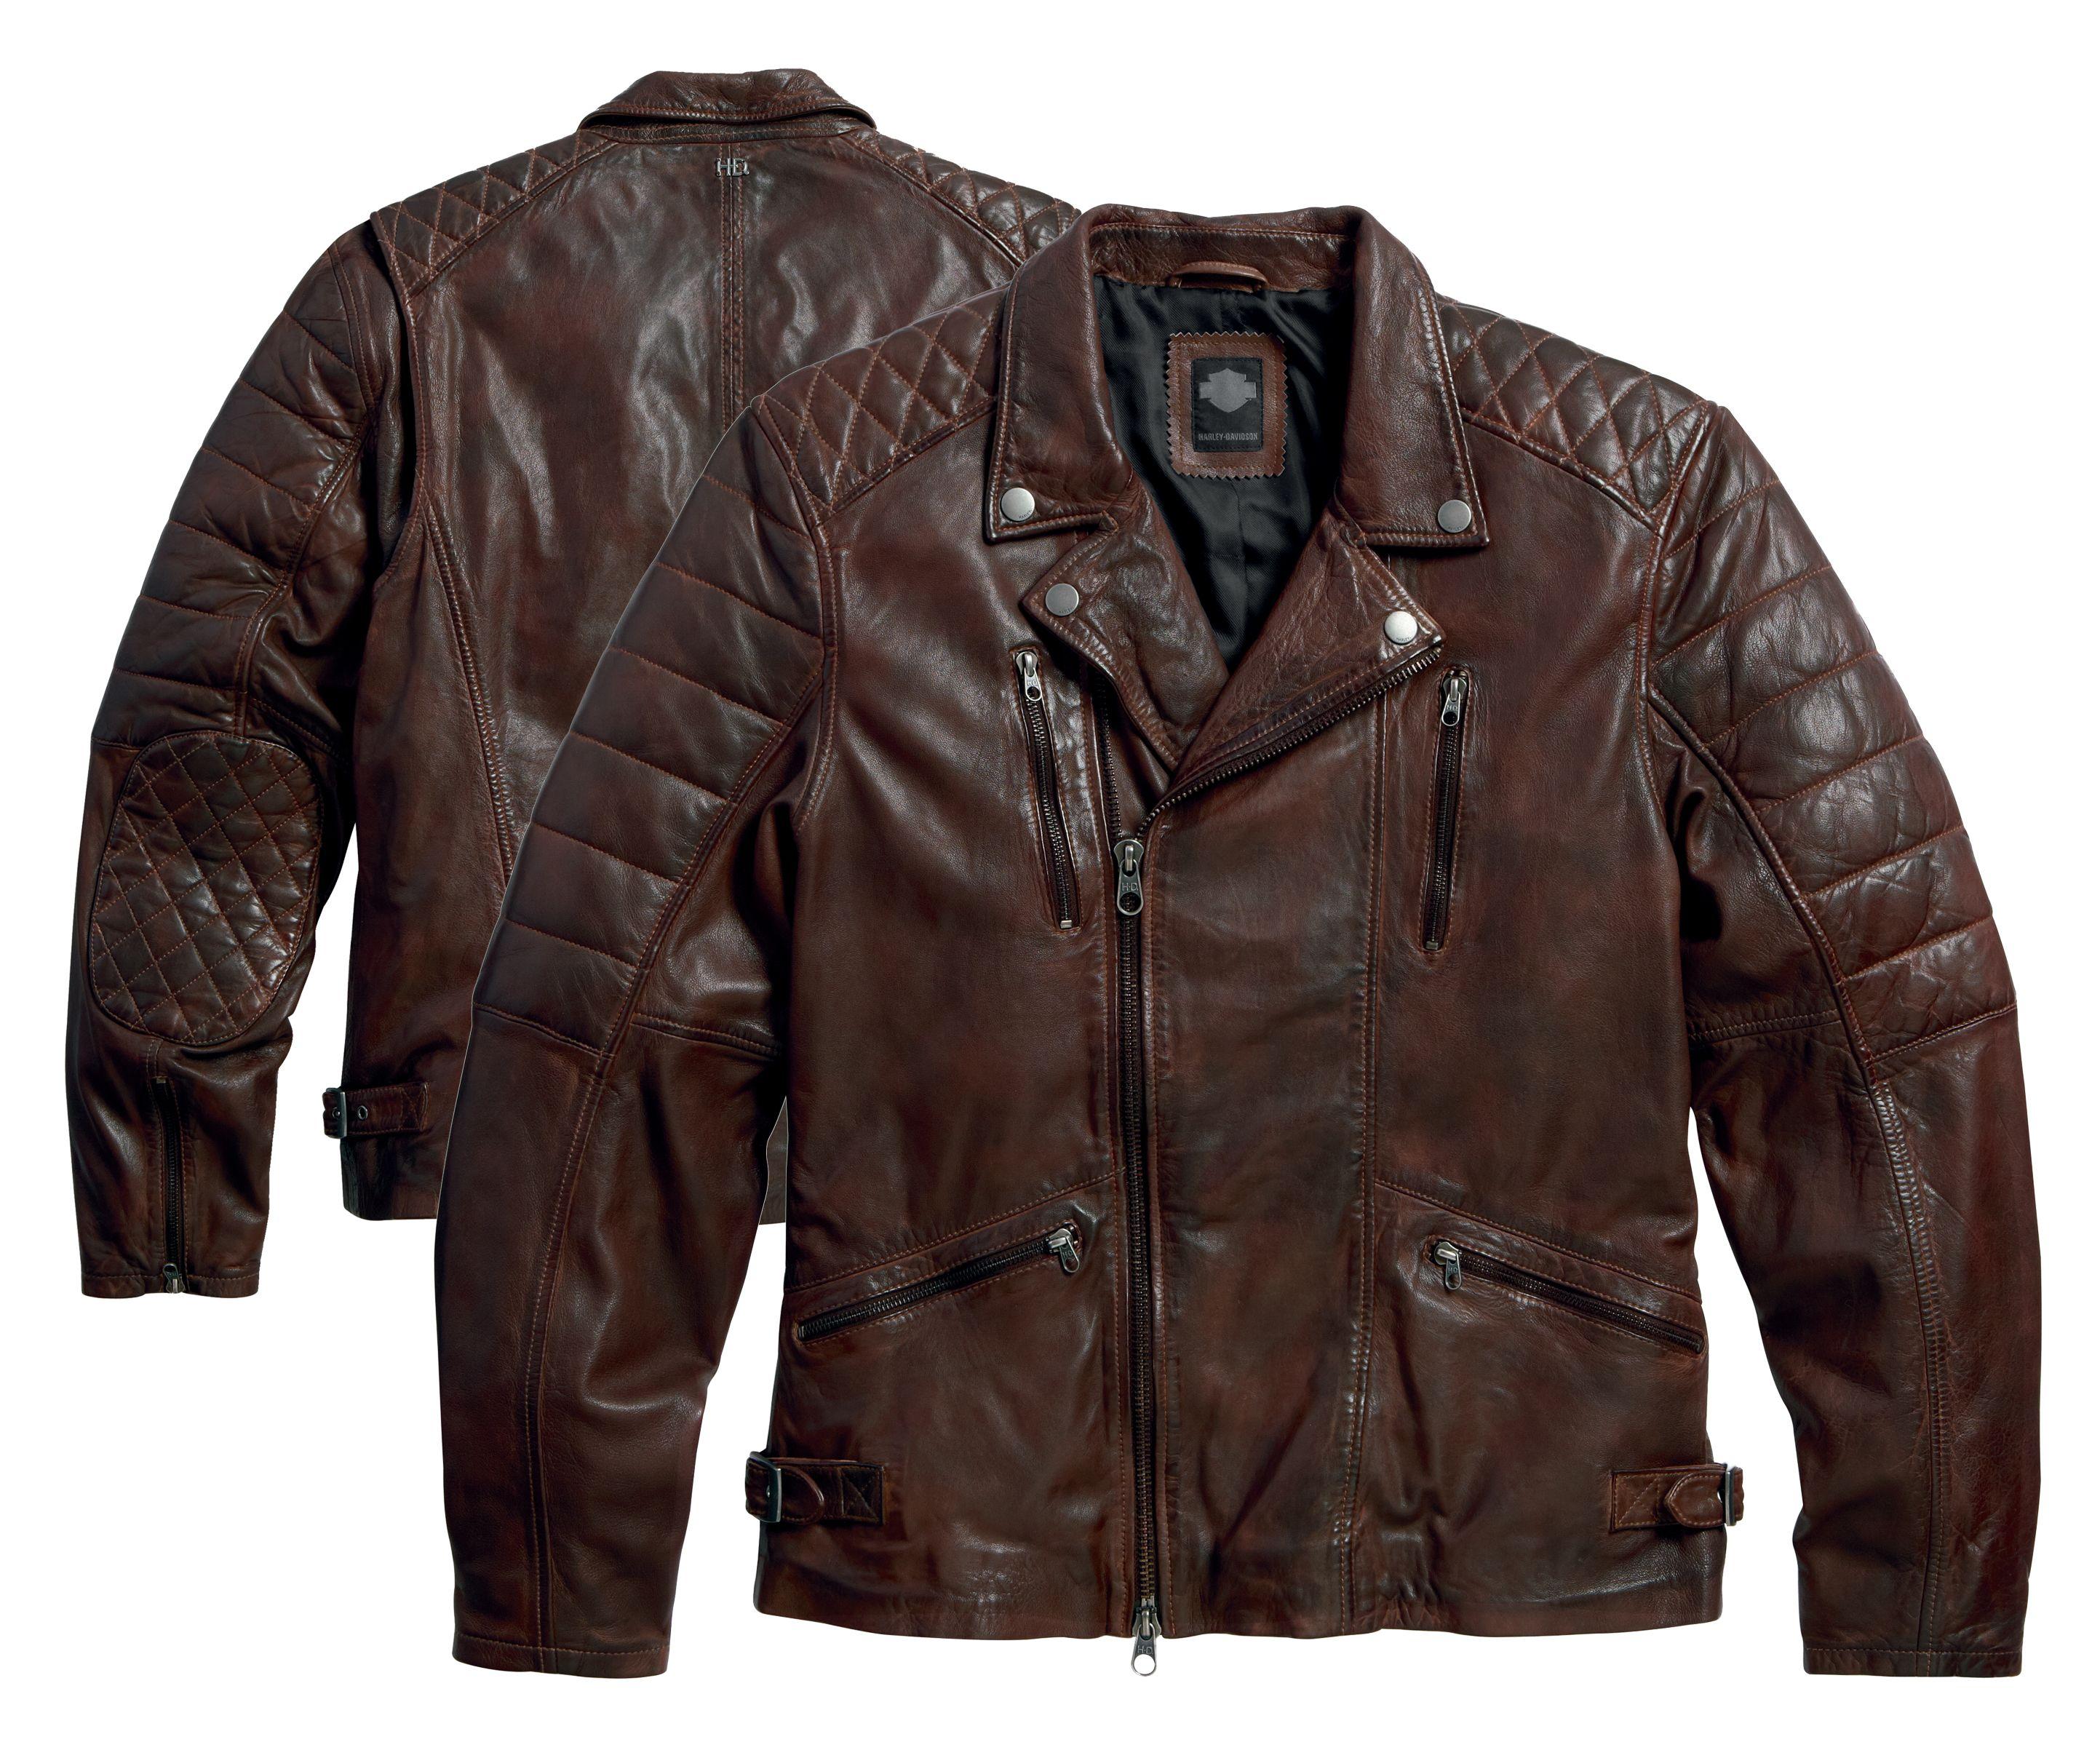 Harley davidson leather jackets clearance